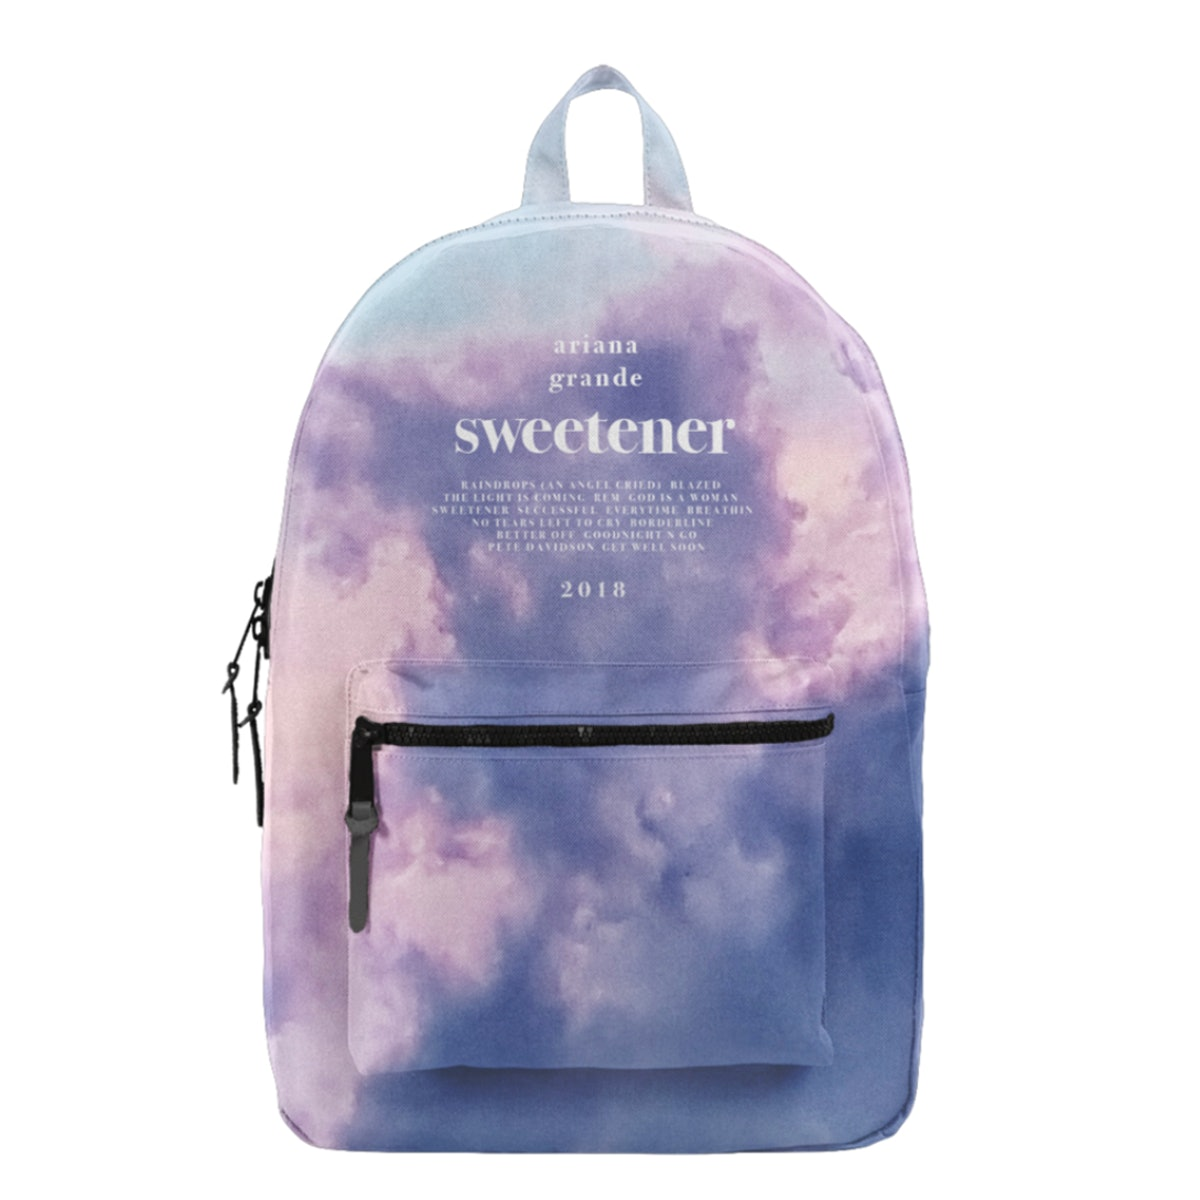 'Sweetener' Backpack + Album